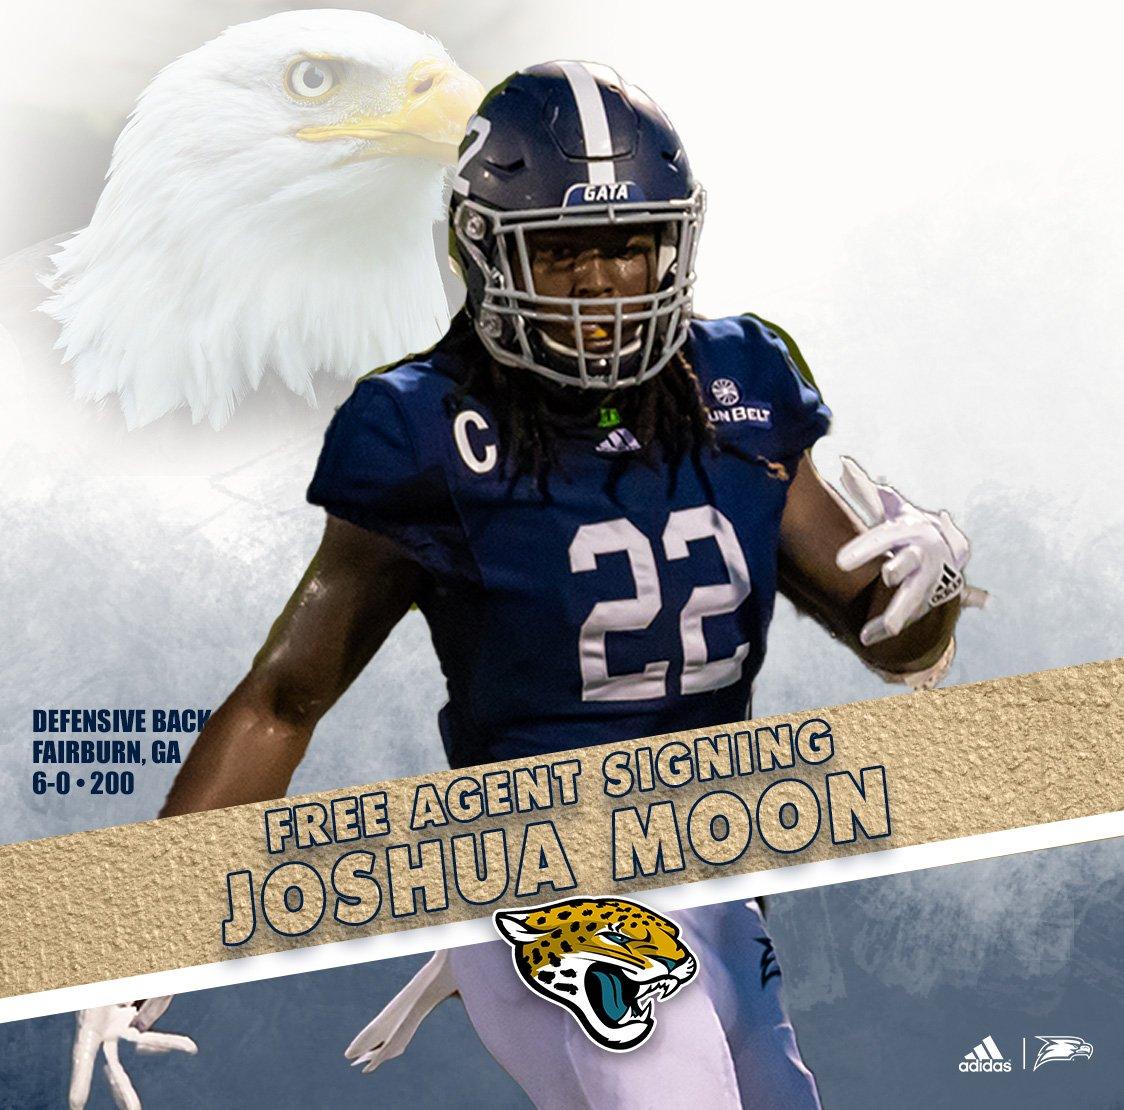 competitive price 13db6 8a034 Joshua Moon (@LookatJMoon) | Twitter